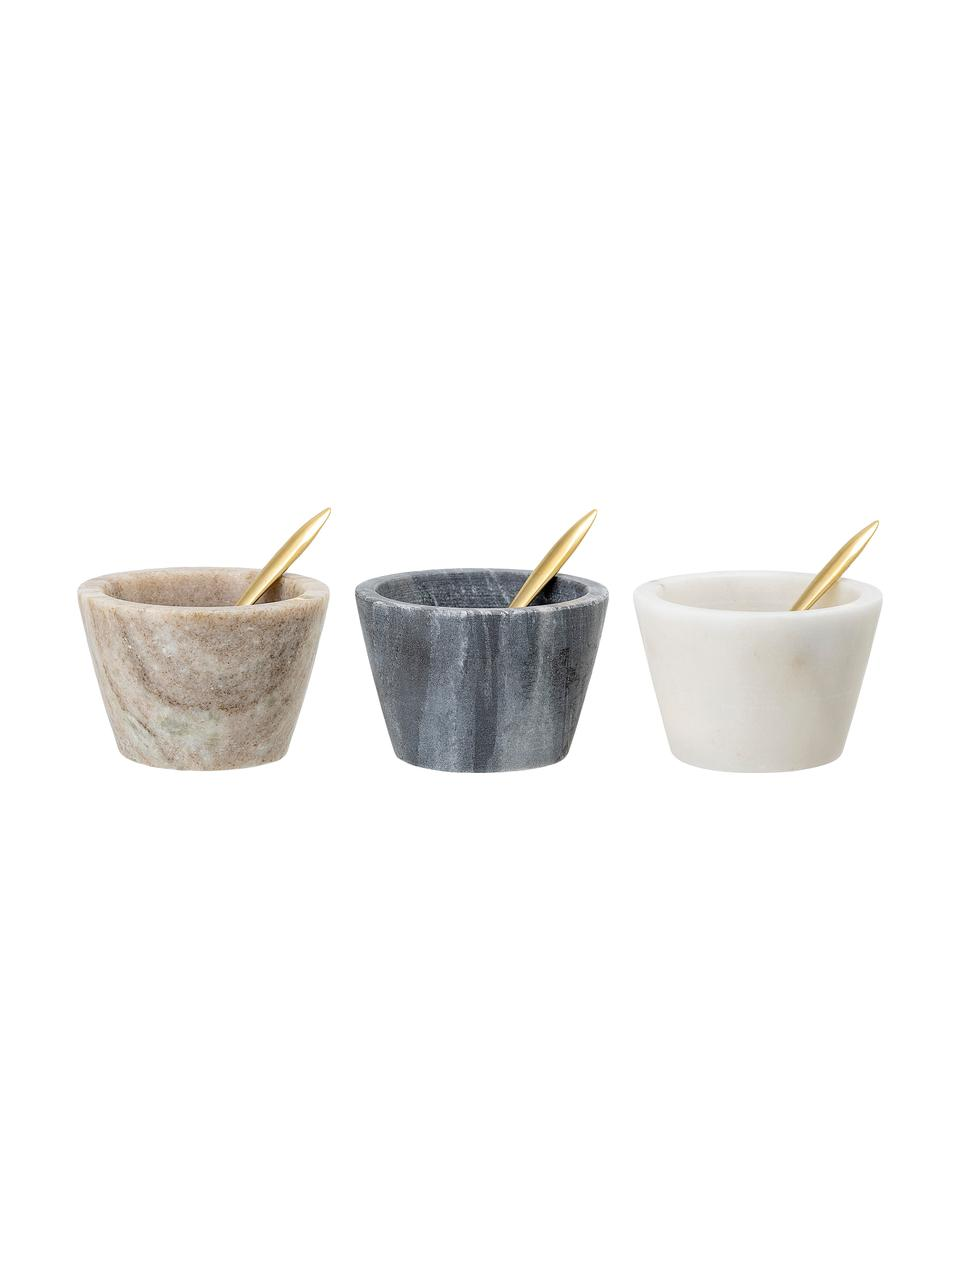 Komplet misek z marmuru Janina, 6 elem., Marmur, mosiądz, Wielobarwny, Ø 8 x W 5 cm